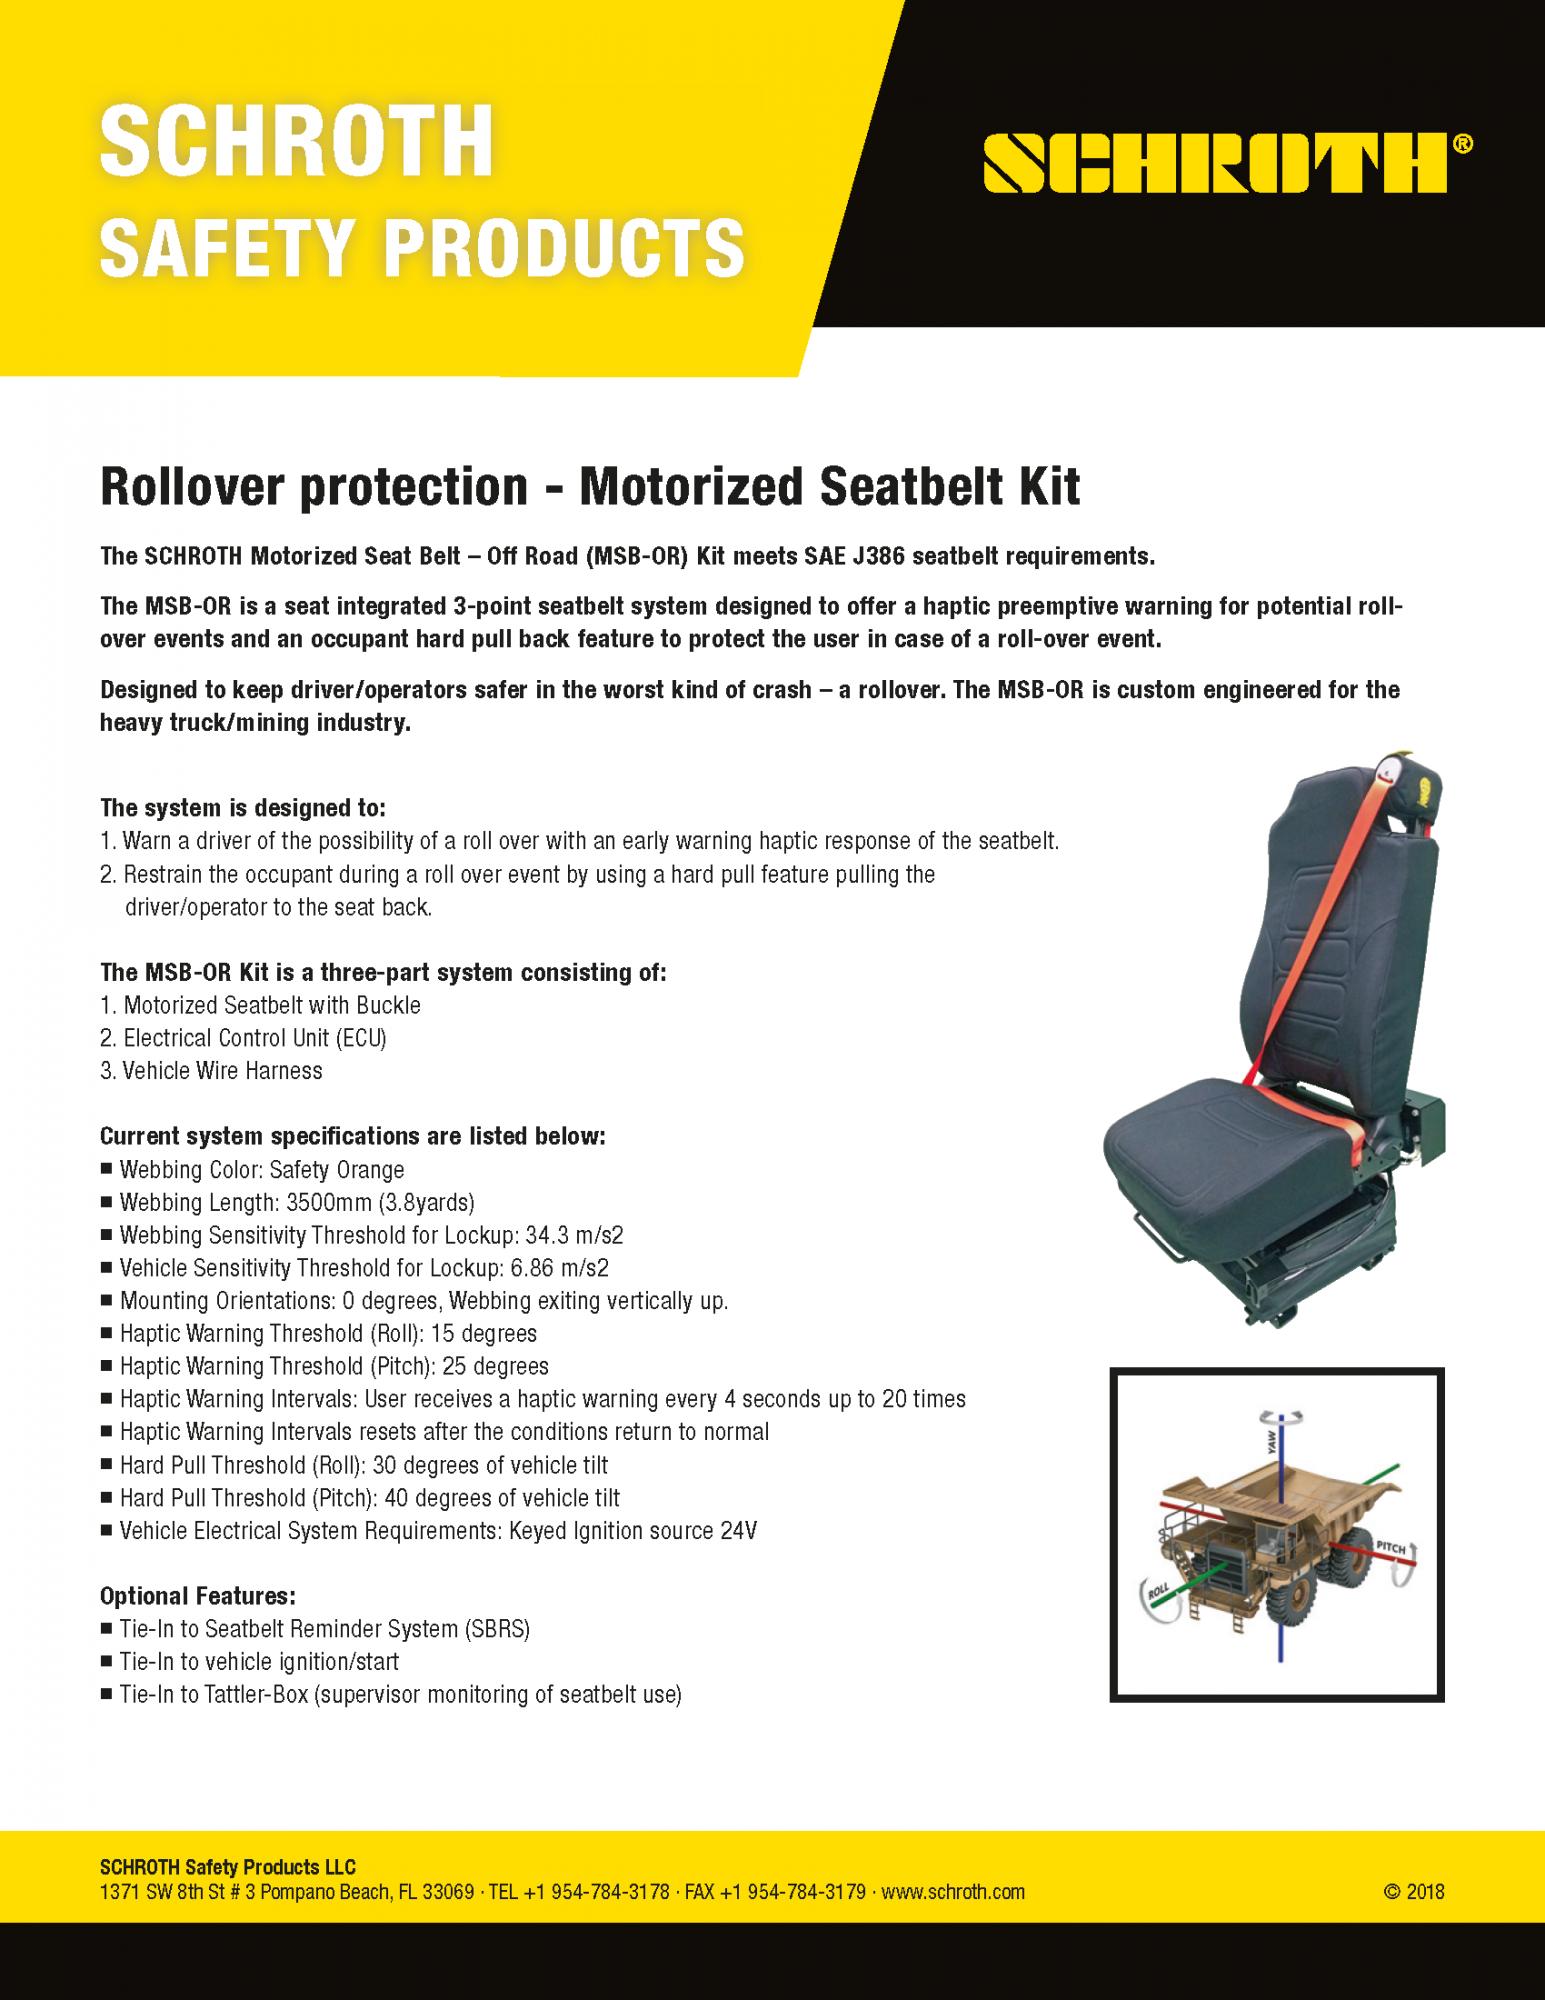 Motorized Seat Belt (MSB) - schroth com   SCHROTH Safety Products